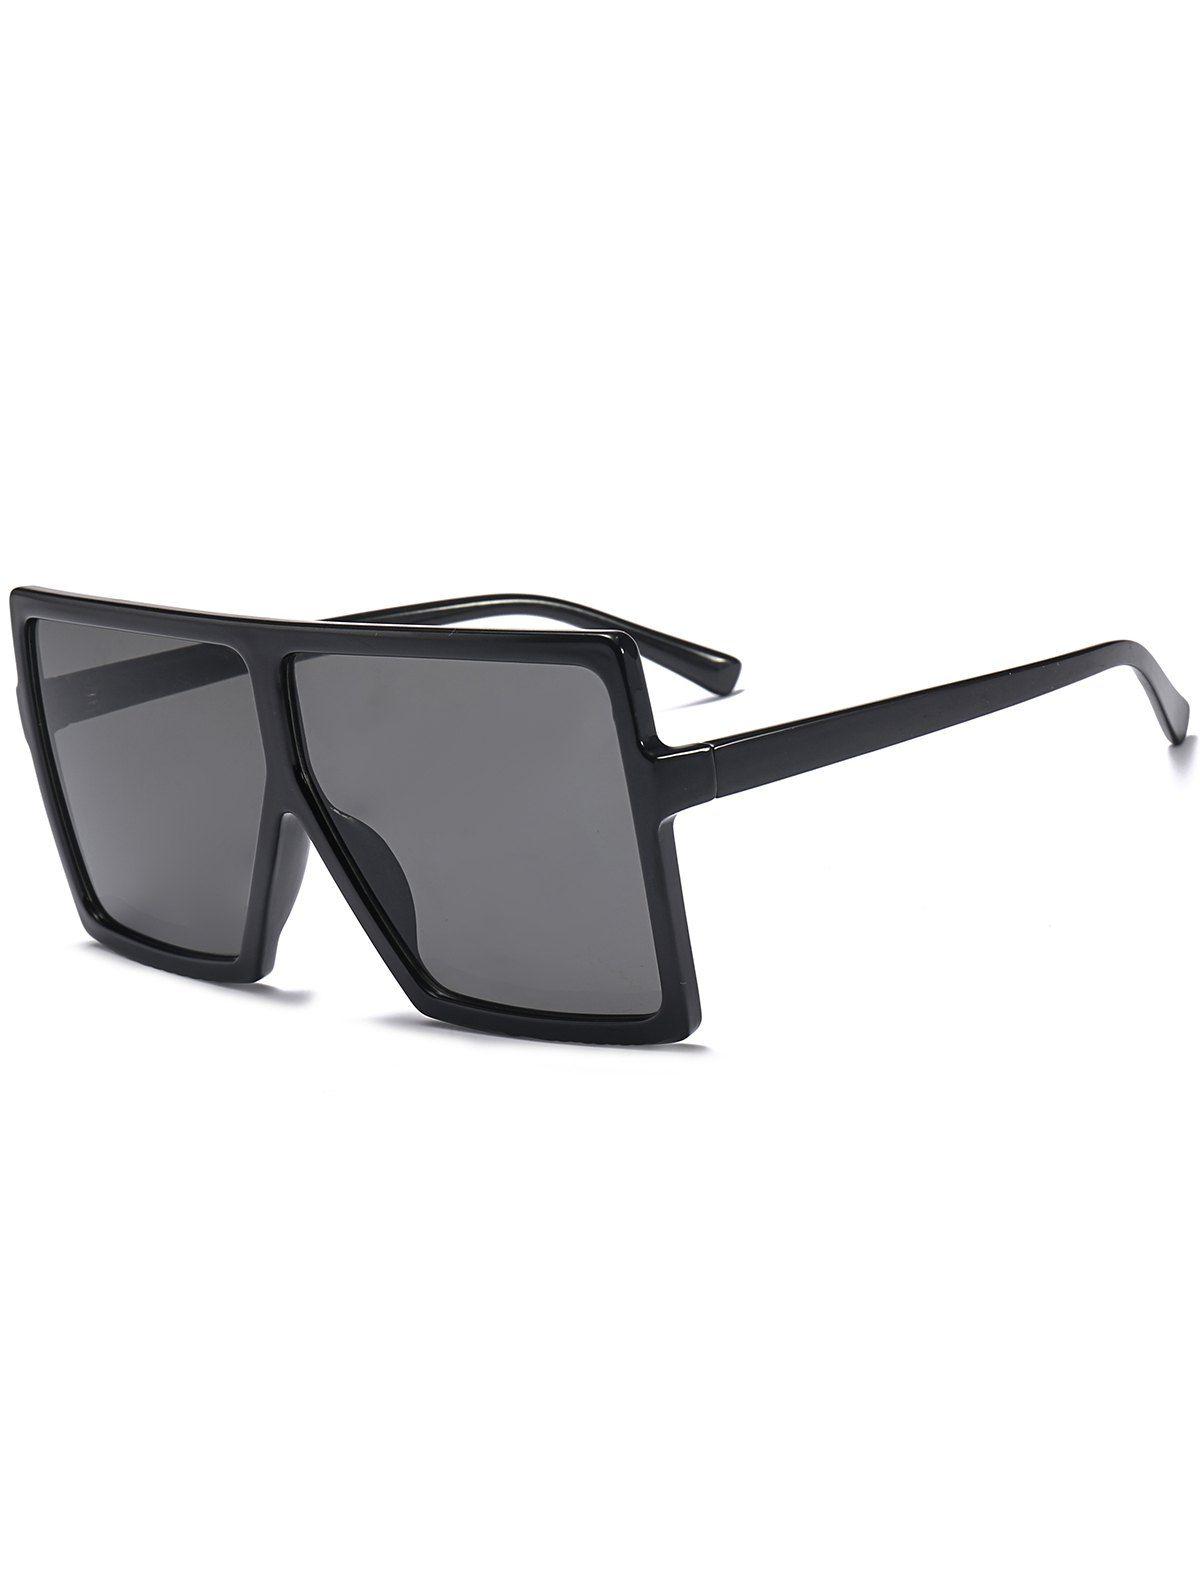 5863ef14bf Oversized Square Full Frame Sunglasses In Bright Black+grey